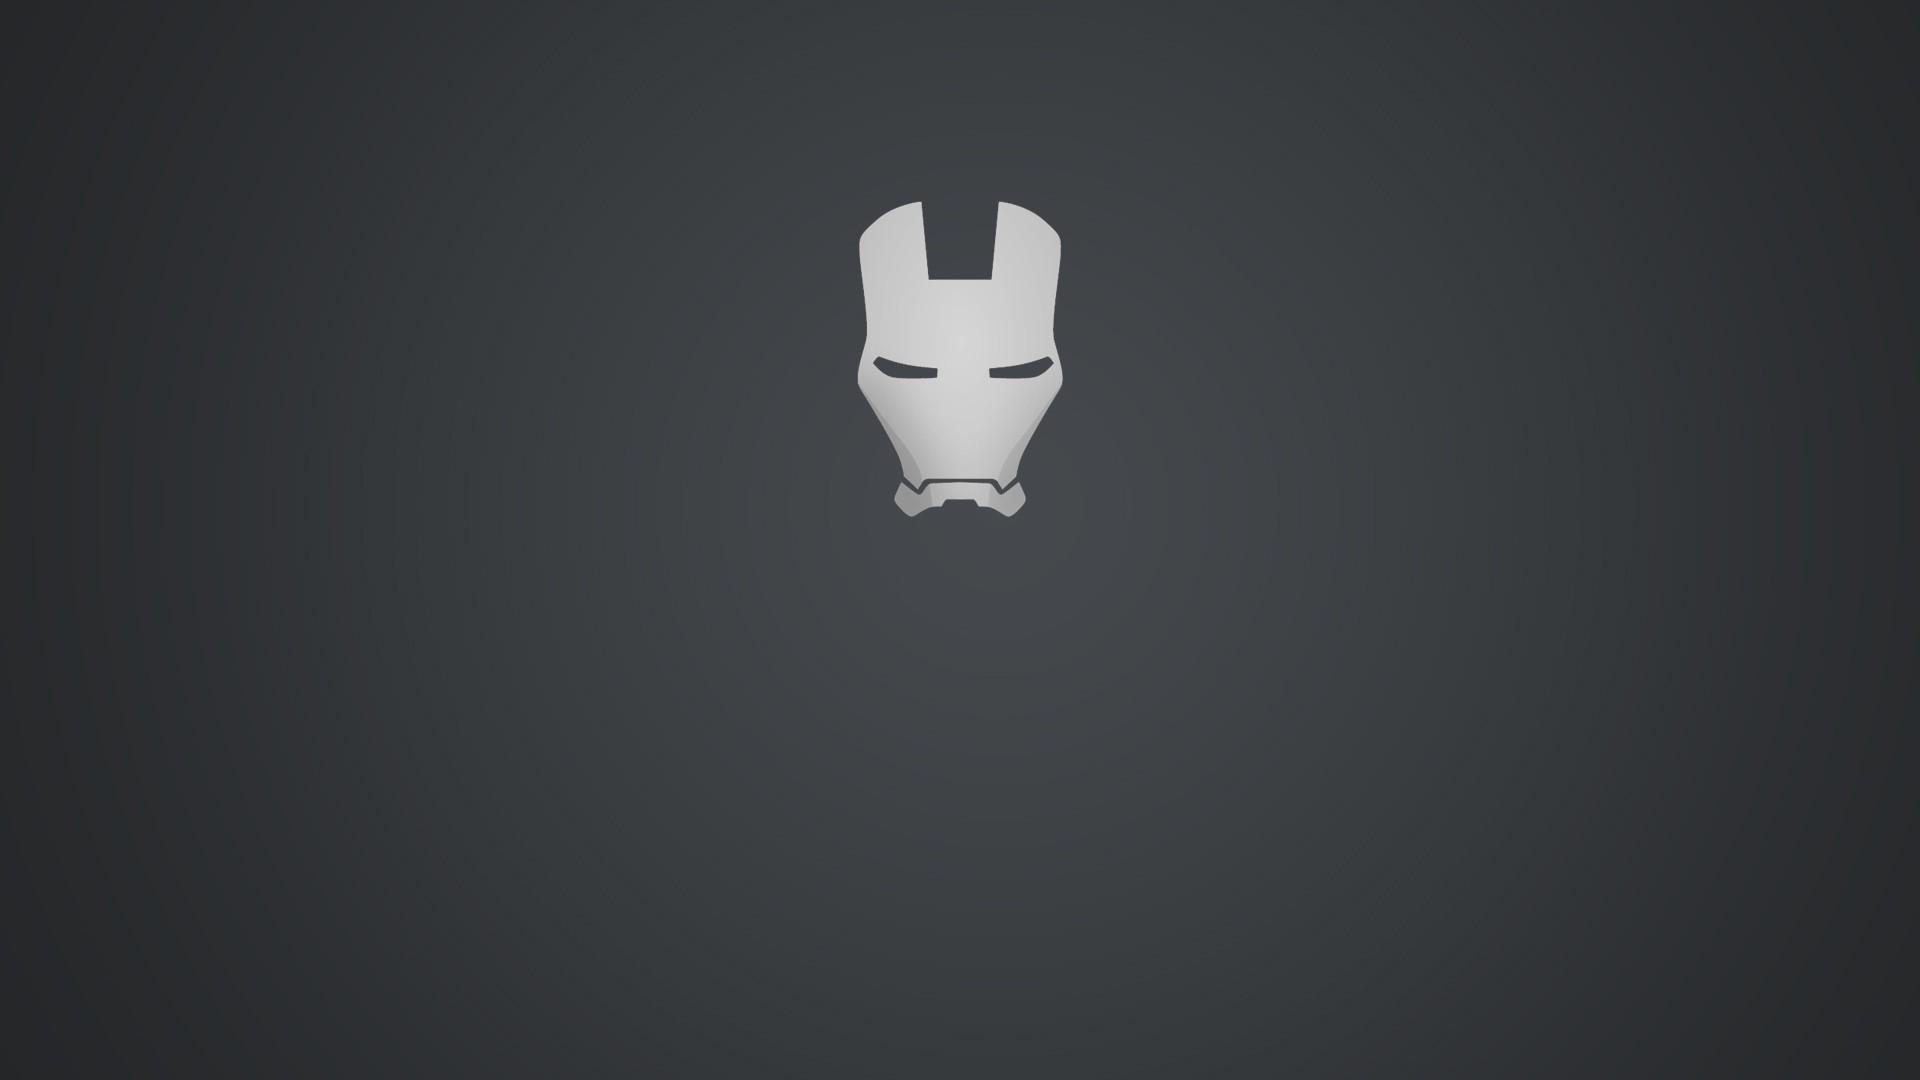 Beautiful Wallpaper High Resolution Iron Man - iron-man-simple-3-wallpaper  You Should Have_233646.jpg